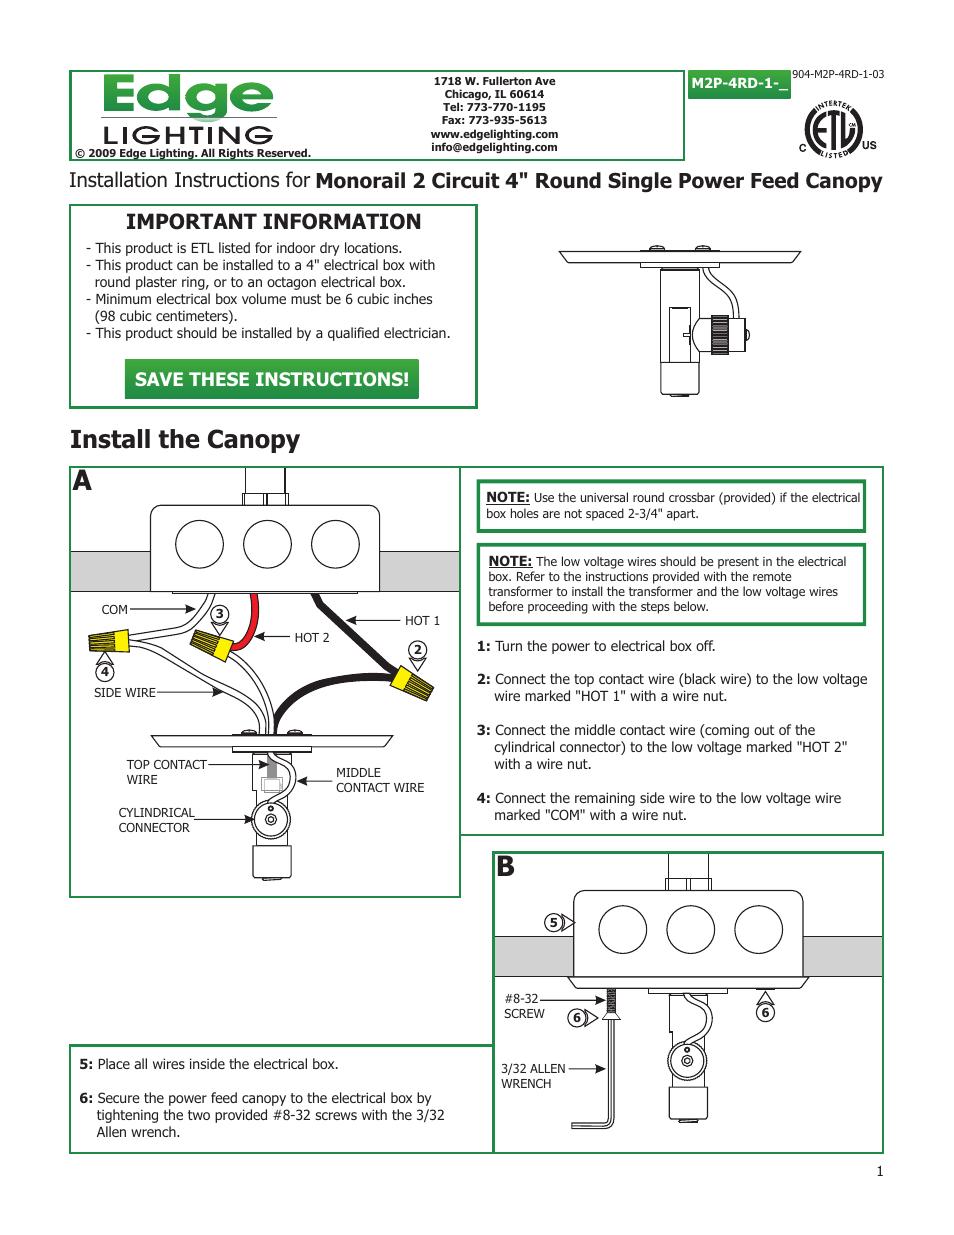 edge lighting 2 circuit 4 power feed canopies user manual 2 pages rh  manualsdir com Flood Light Wiring Diagram 3-Way Switch Light Wiring Diagram